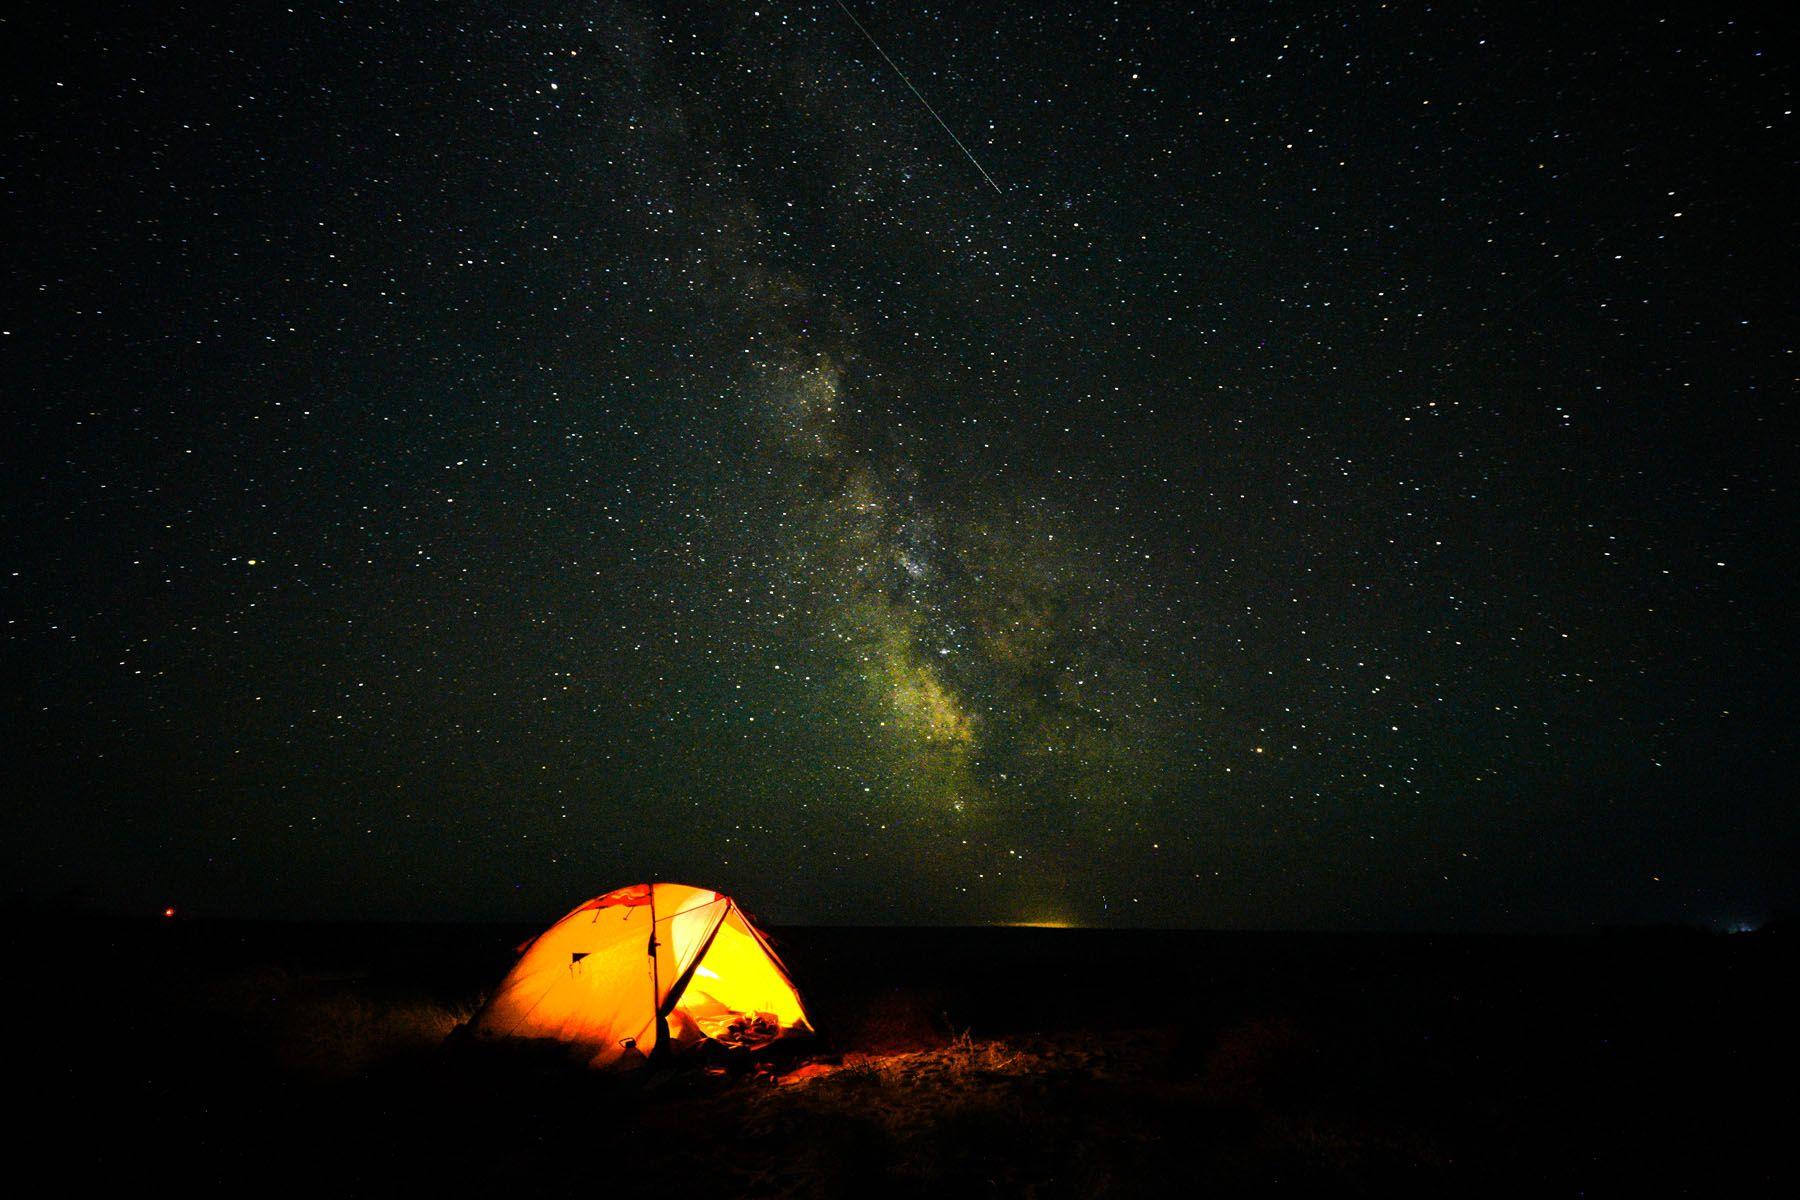 небо над озером Балхаш - Казахстан